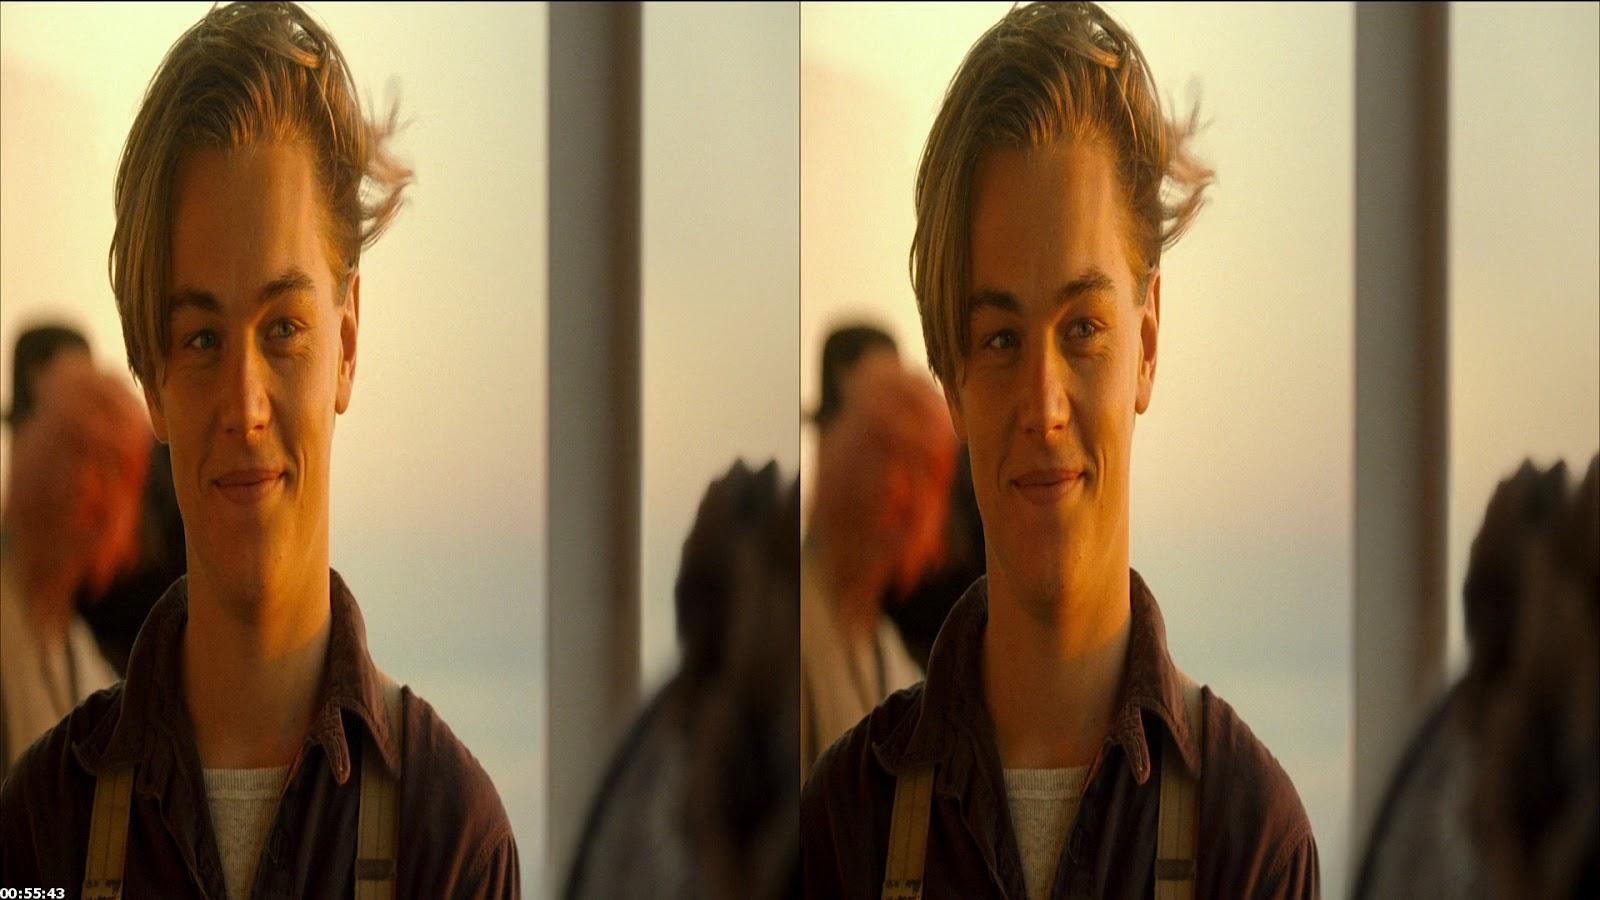 imagenes Titanic 3D Full HD 1080p Español Latino Descargar